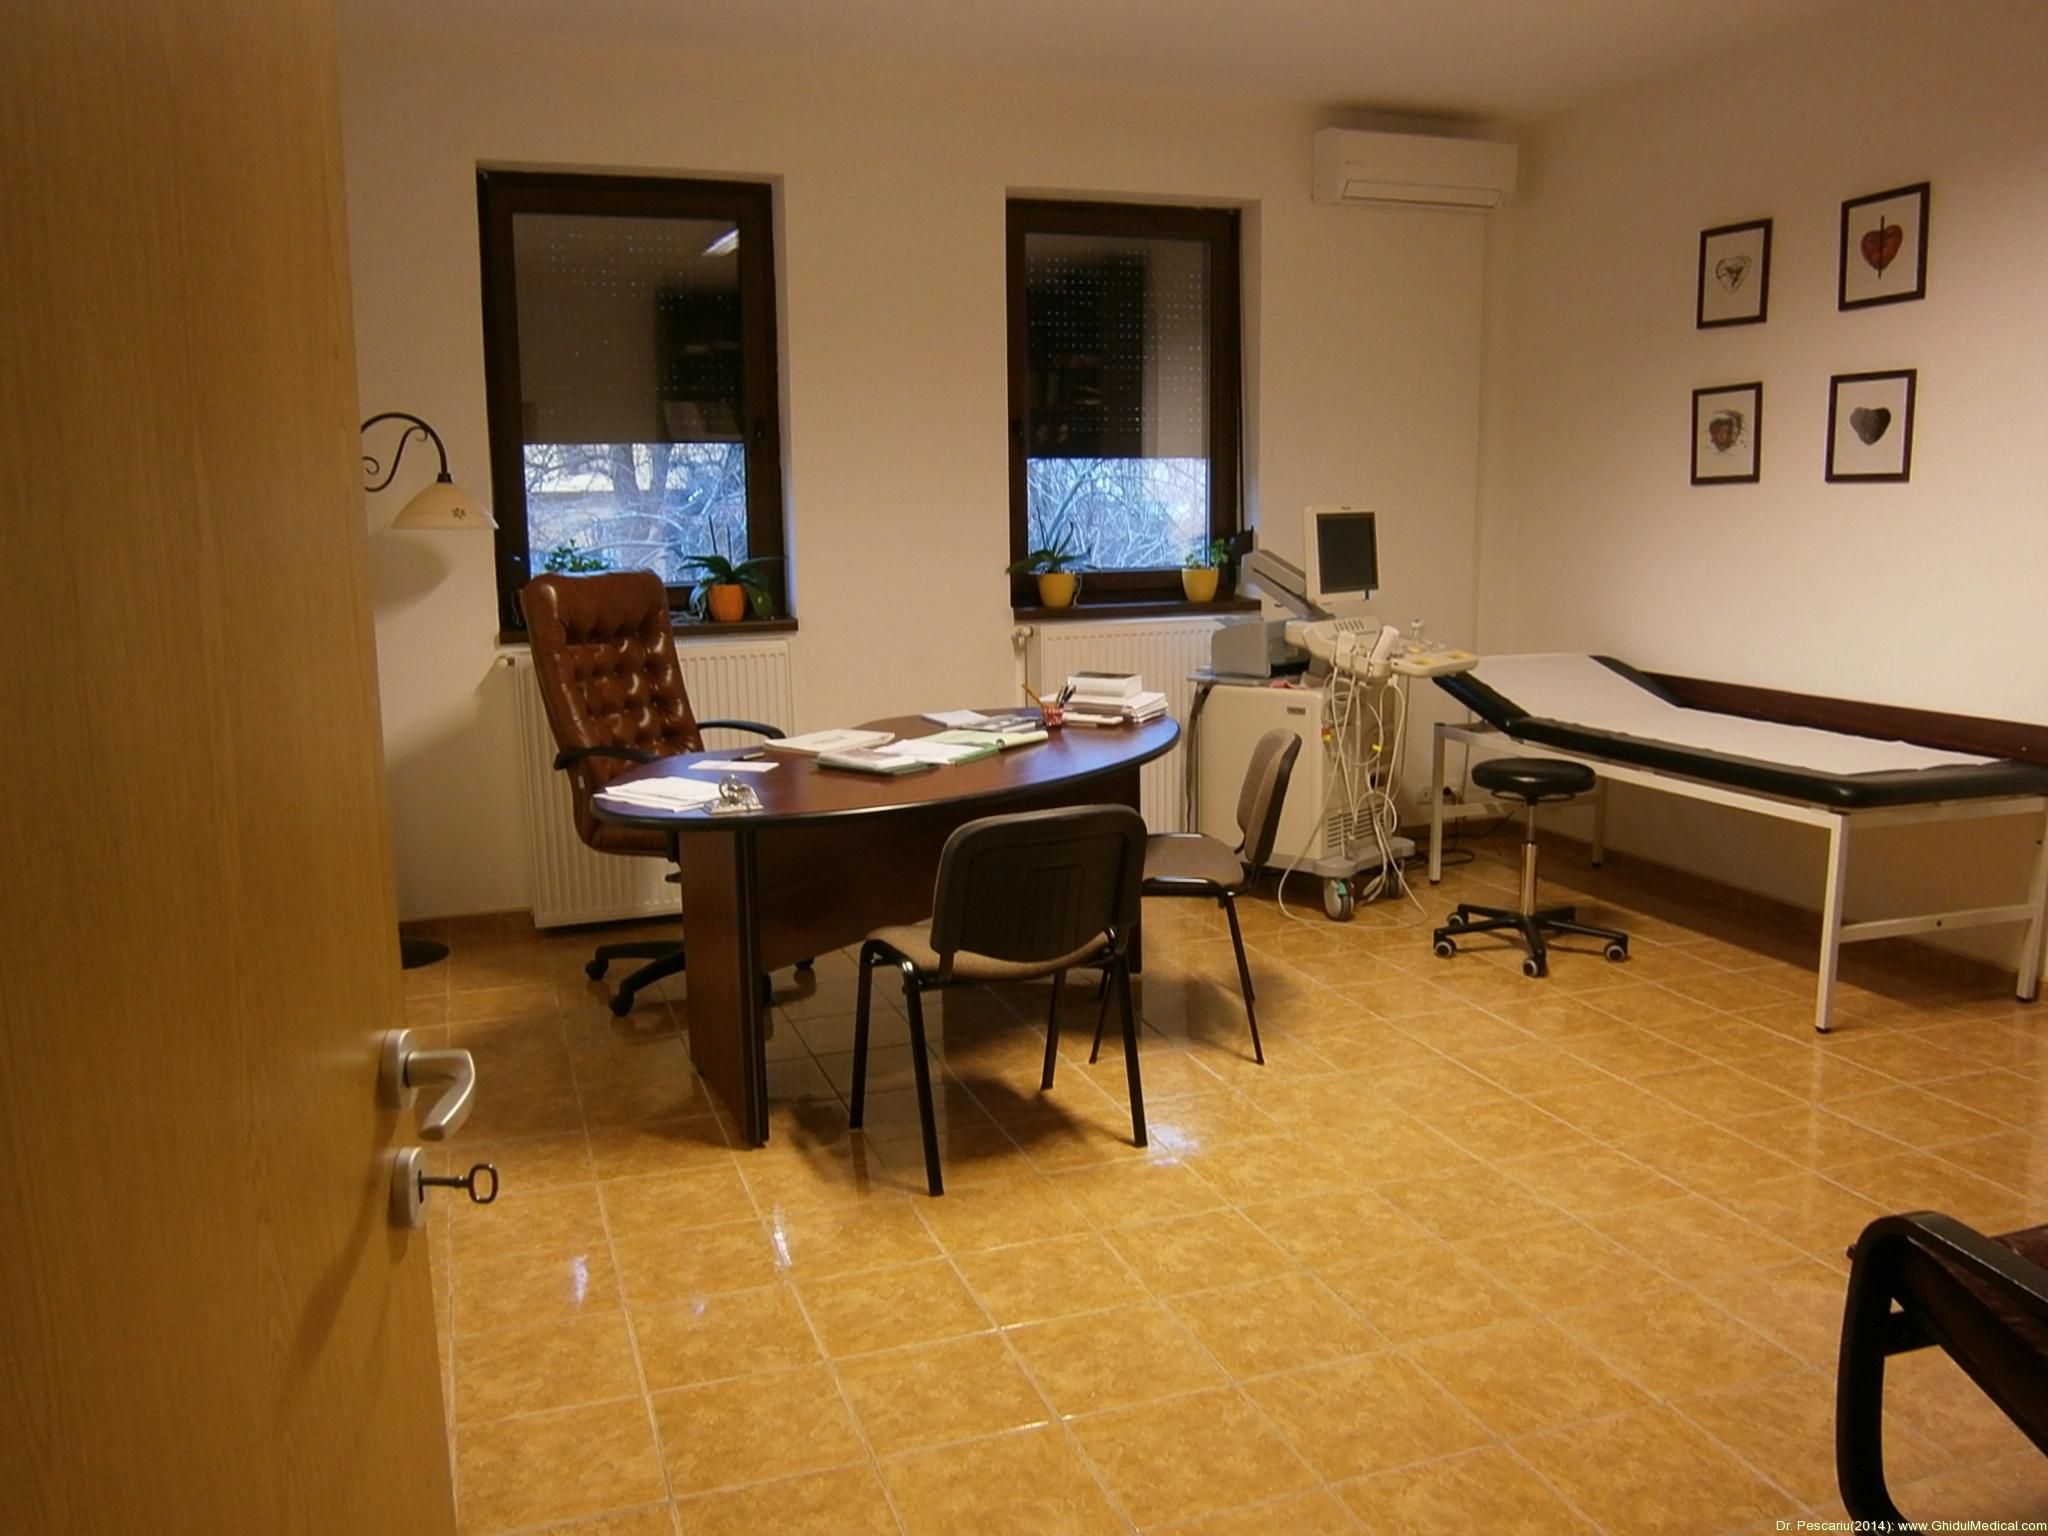 Cabinet de cardiologie - Cabinet medical poitiers ...